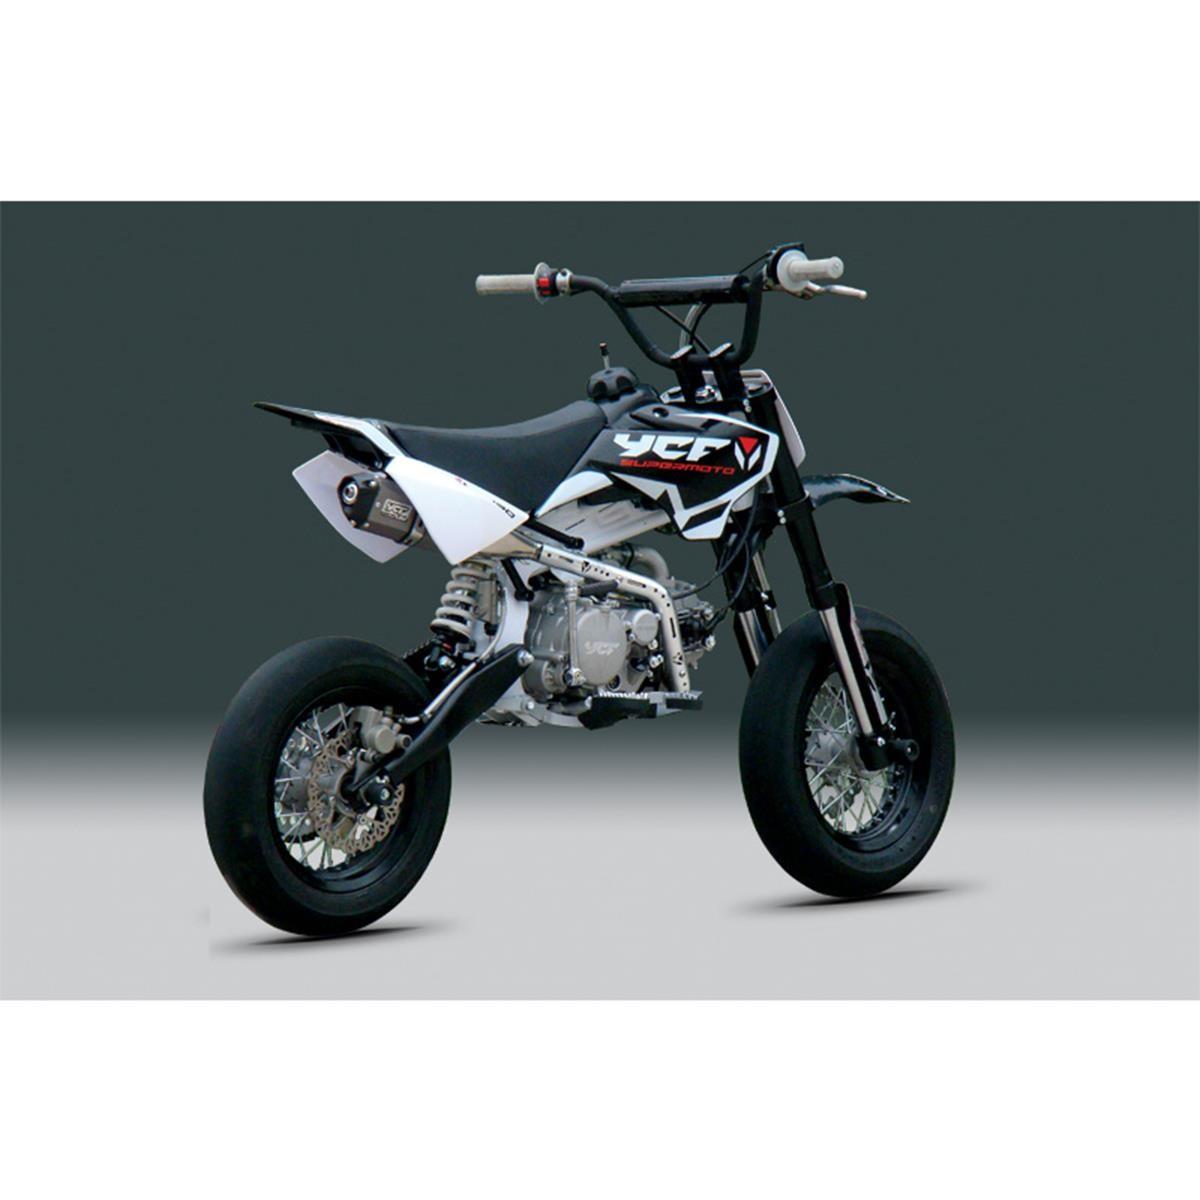 ycf 150 supermoto pitbike maciag offroad. Black Bedroom Furniture Sets. Home Design Ideas